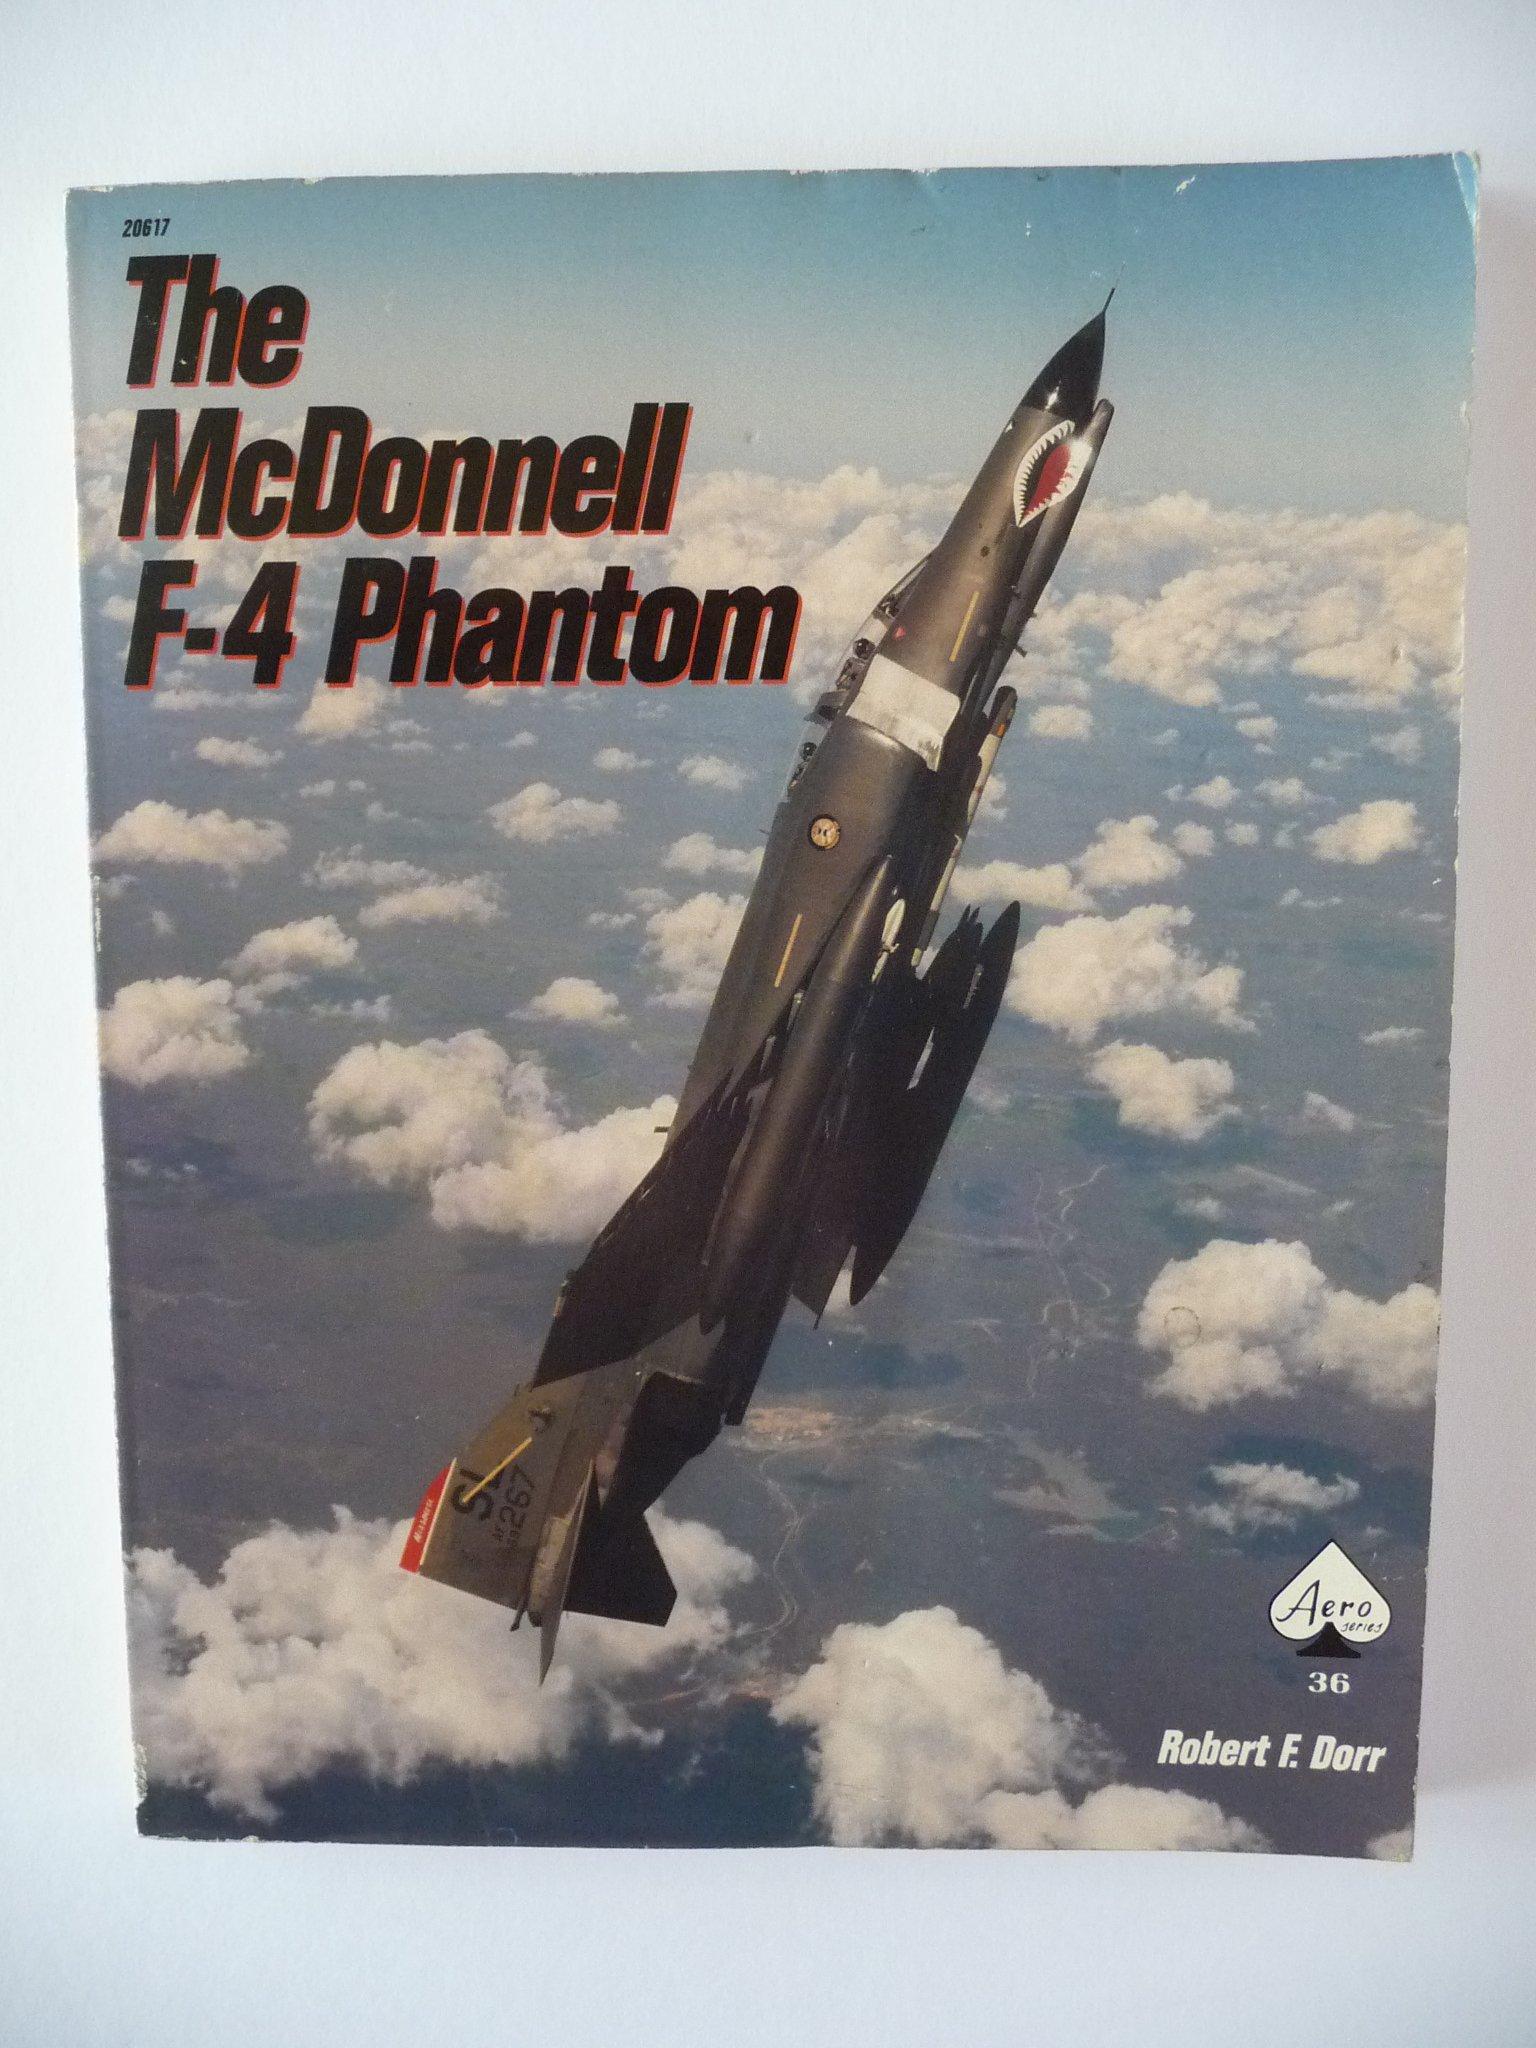 The McDonnell F-4 Phantom II - Aero Series 36